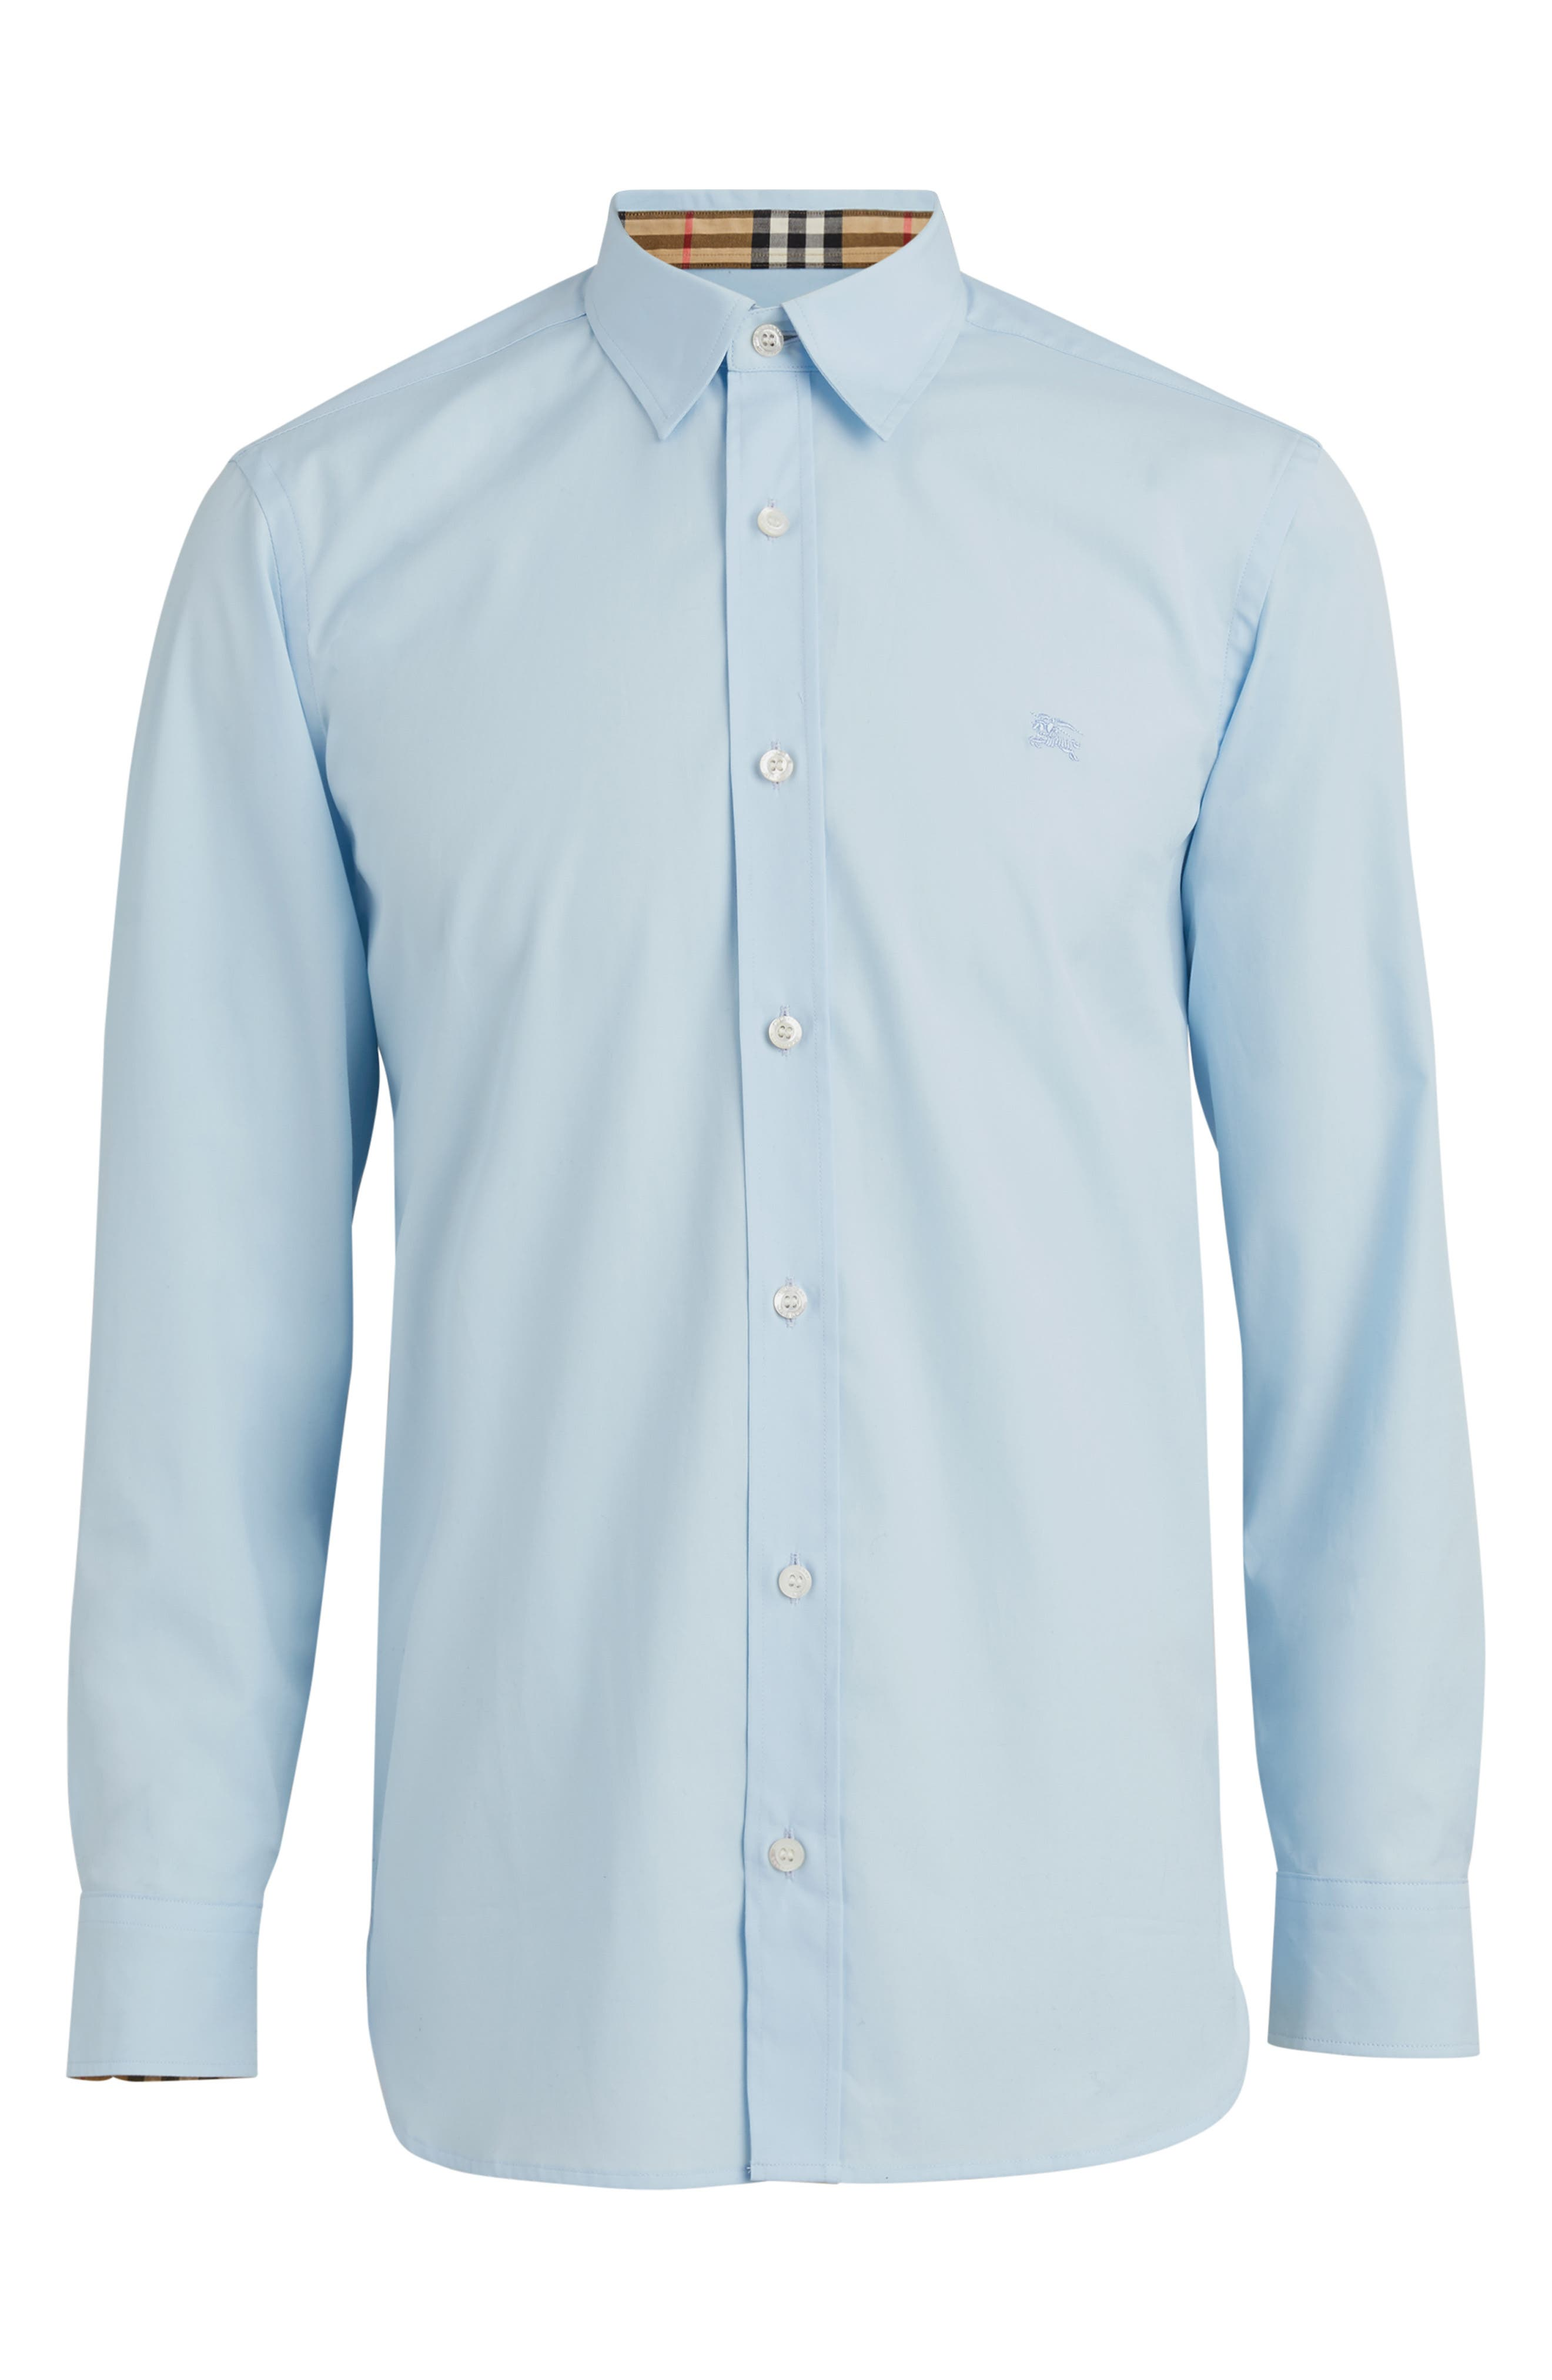 BURBERRY,                             William Stretch Poplin Sport Shirt,                             Alternate thumbnail 4, color,                             400